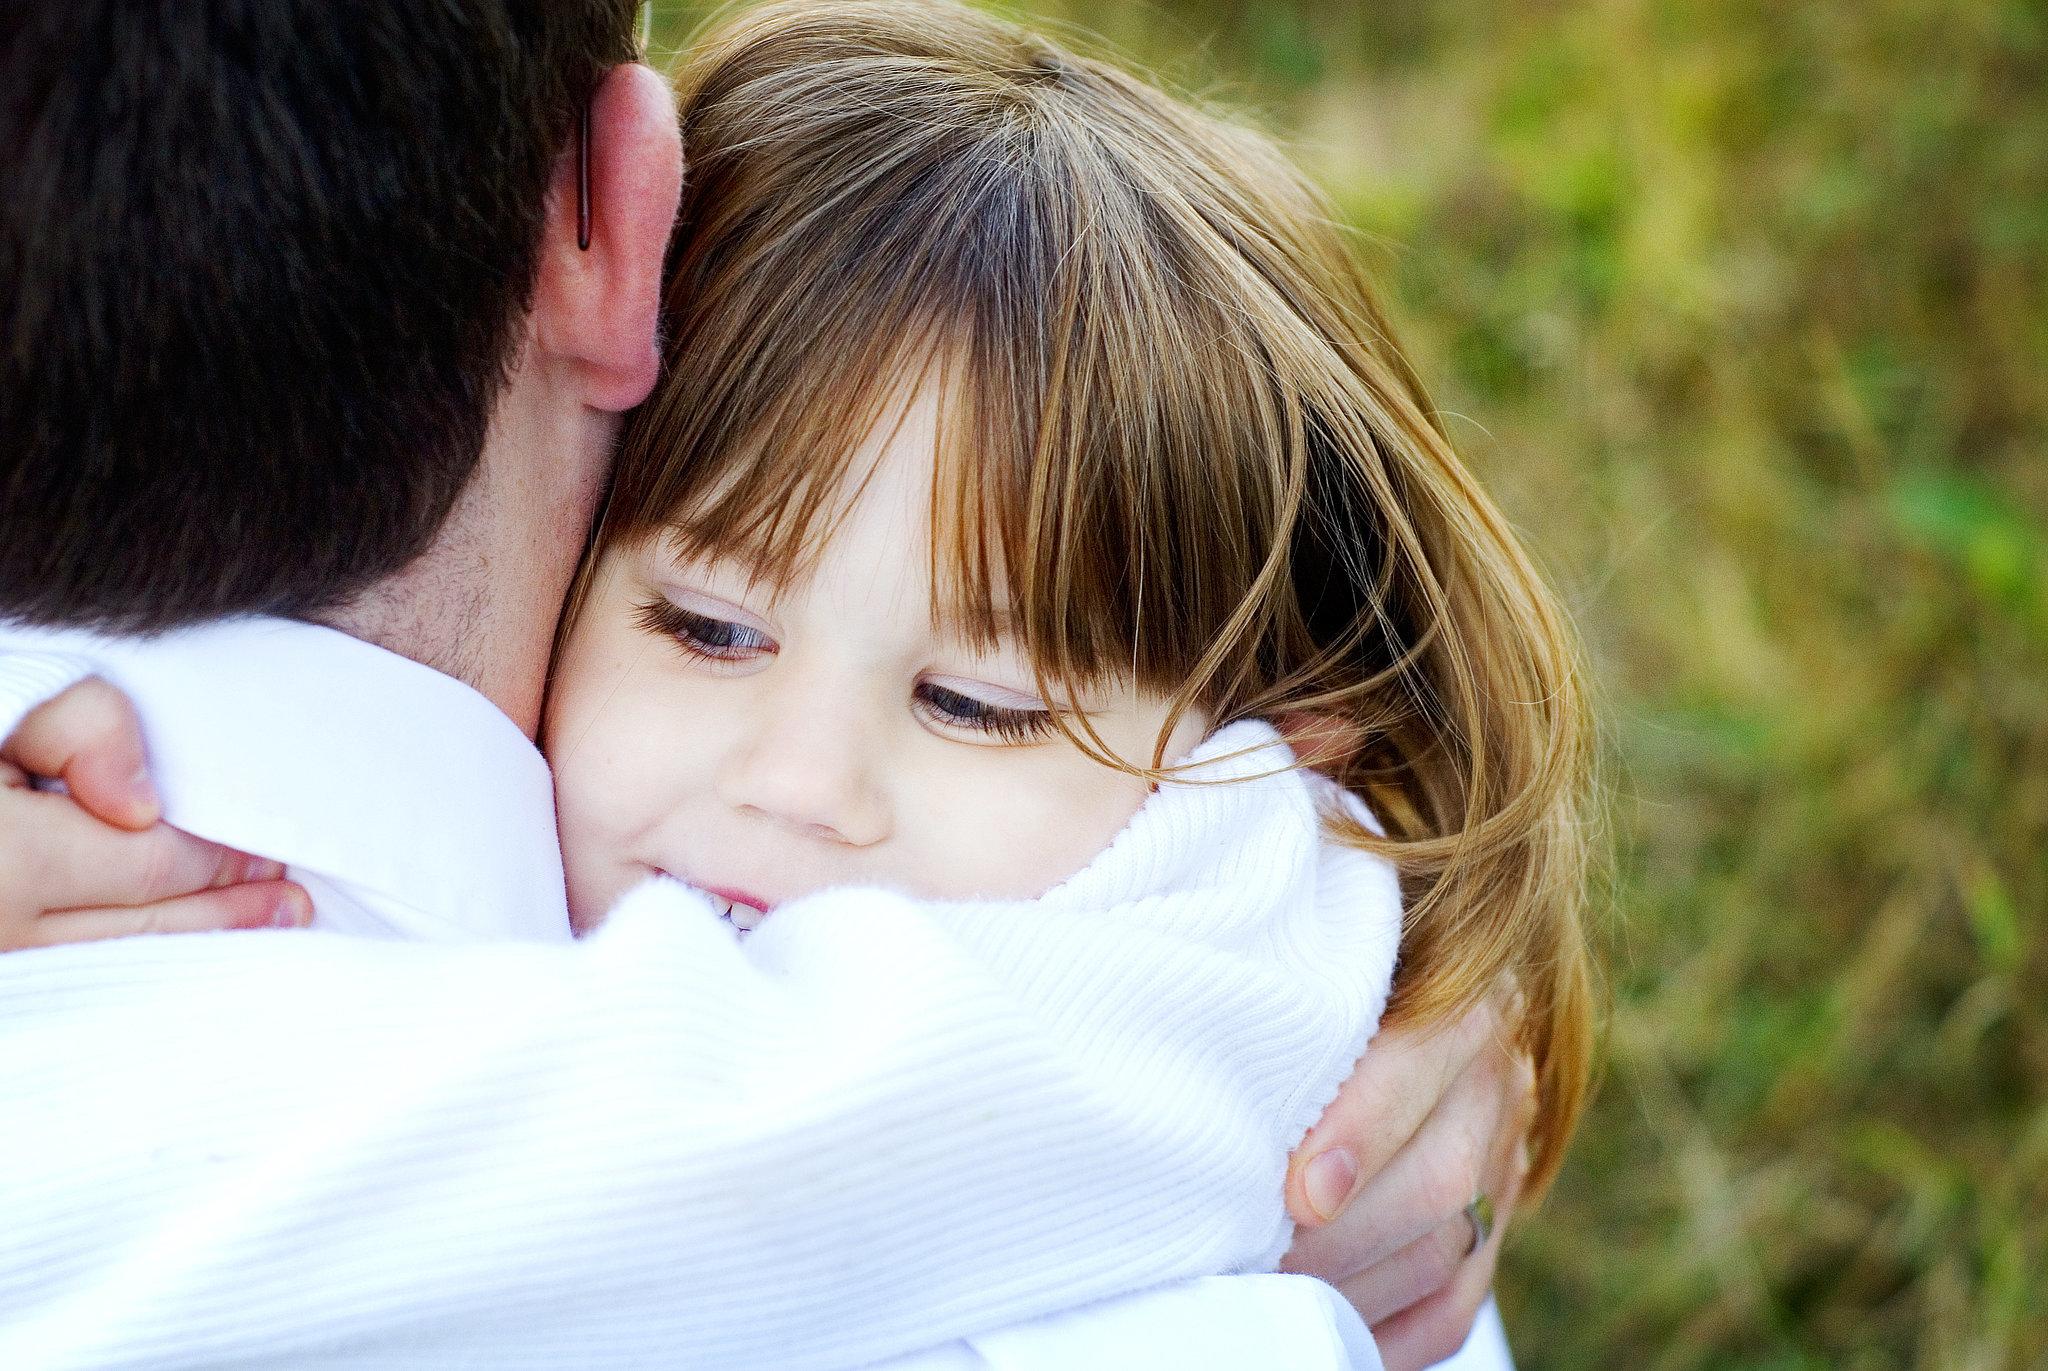 https://i2.wp.com/media1.popsugar-assets.com/files/2014/09/17/907/n/24155406/b512cebeb5560077_hugQz3D1C.xxxlarge_2x/i/Hugging-Your-Child-Too-Tight.jpg